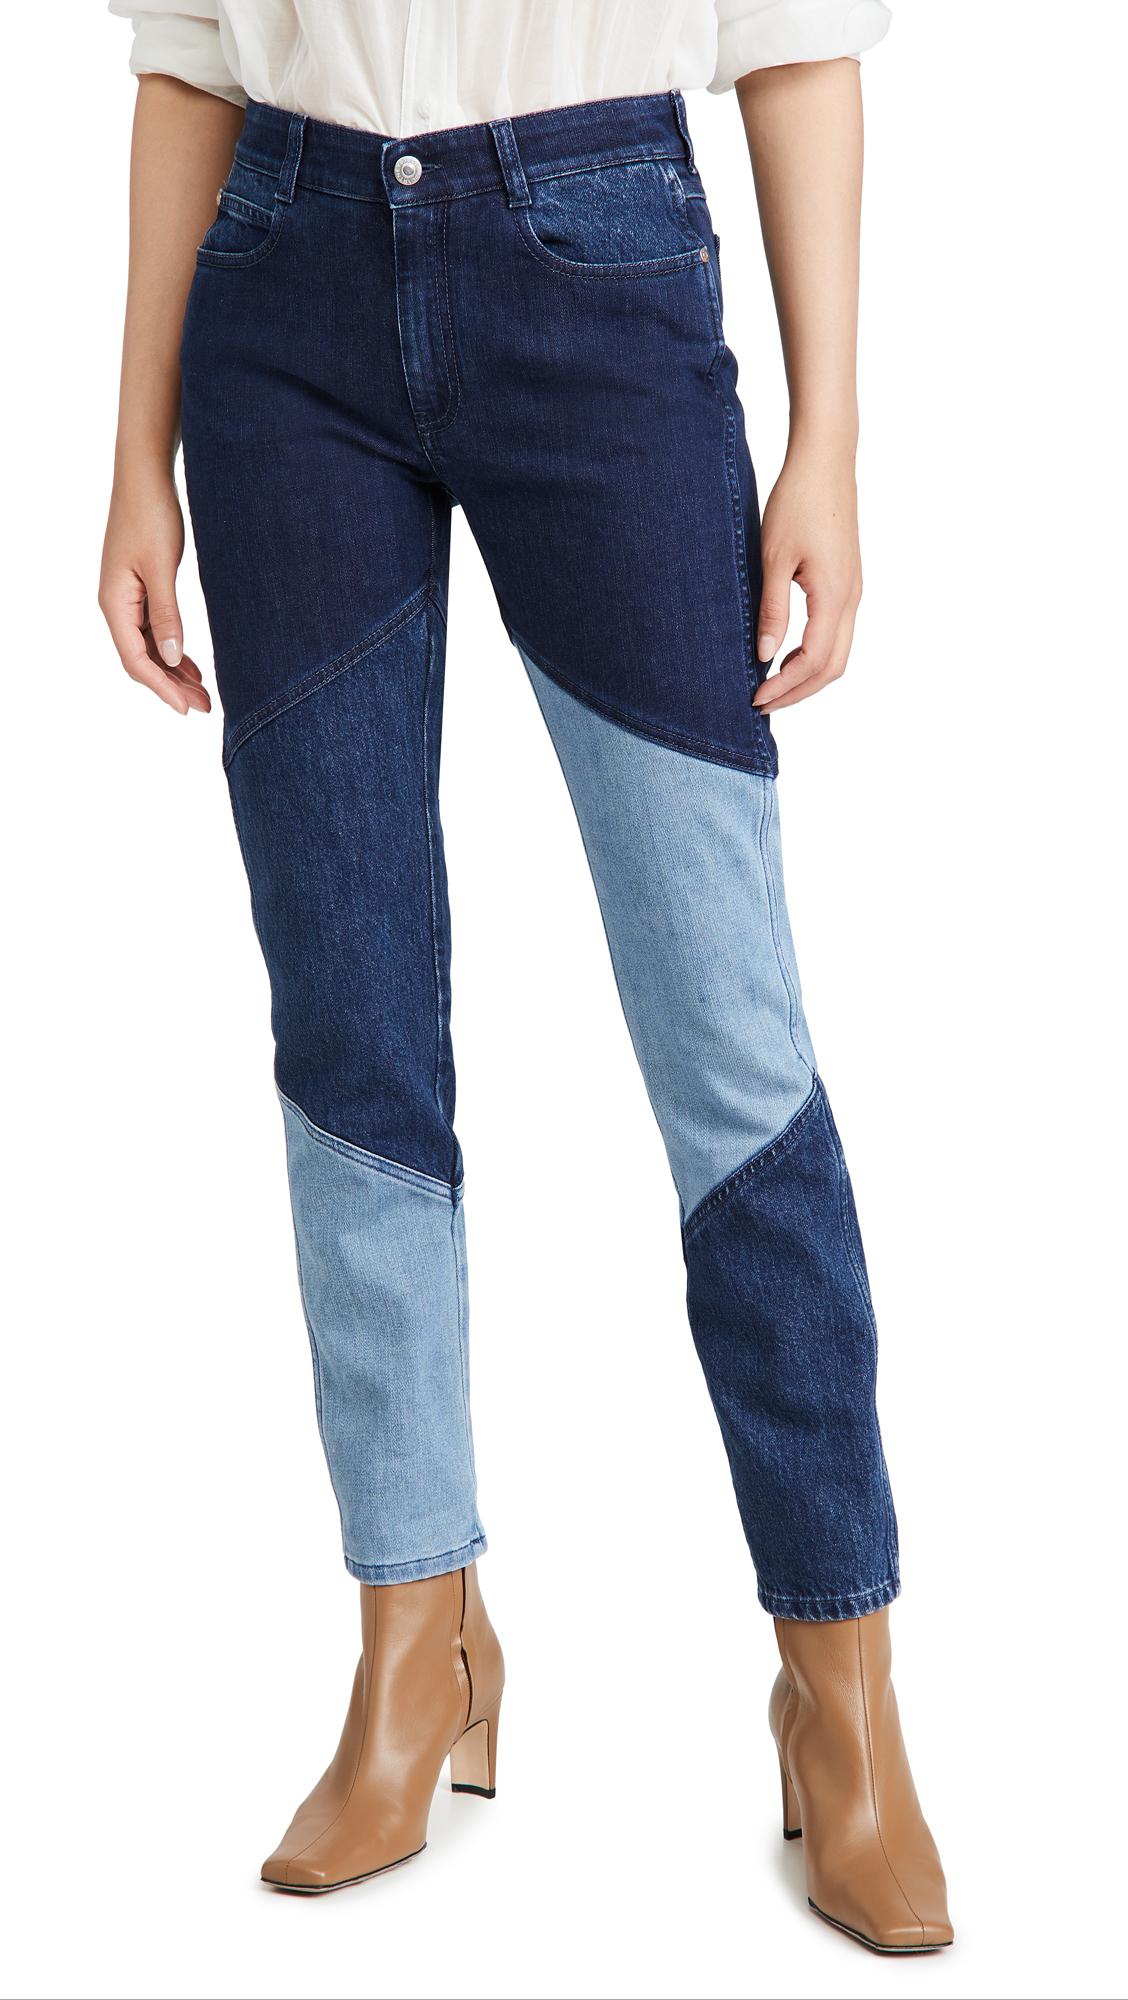 Stella McCartney Stella Upcycle Jeans